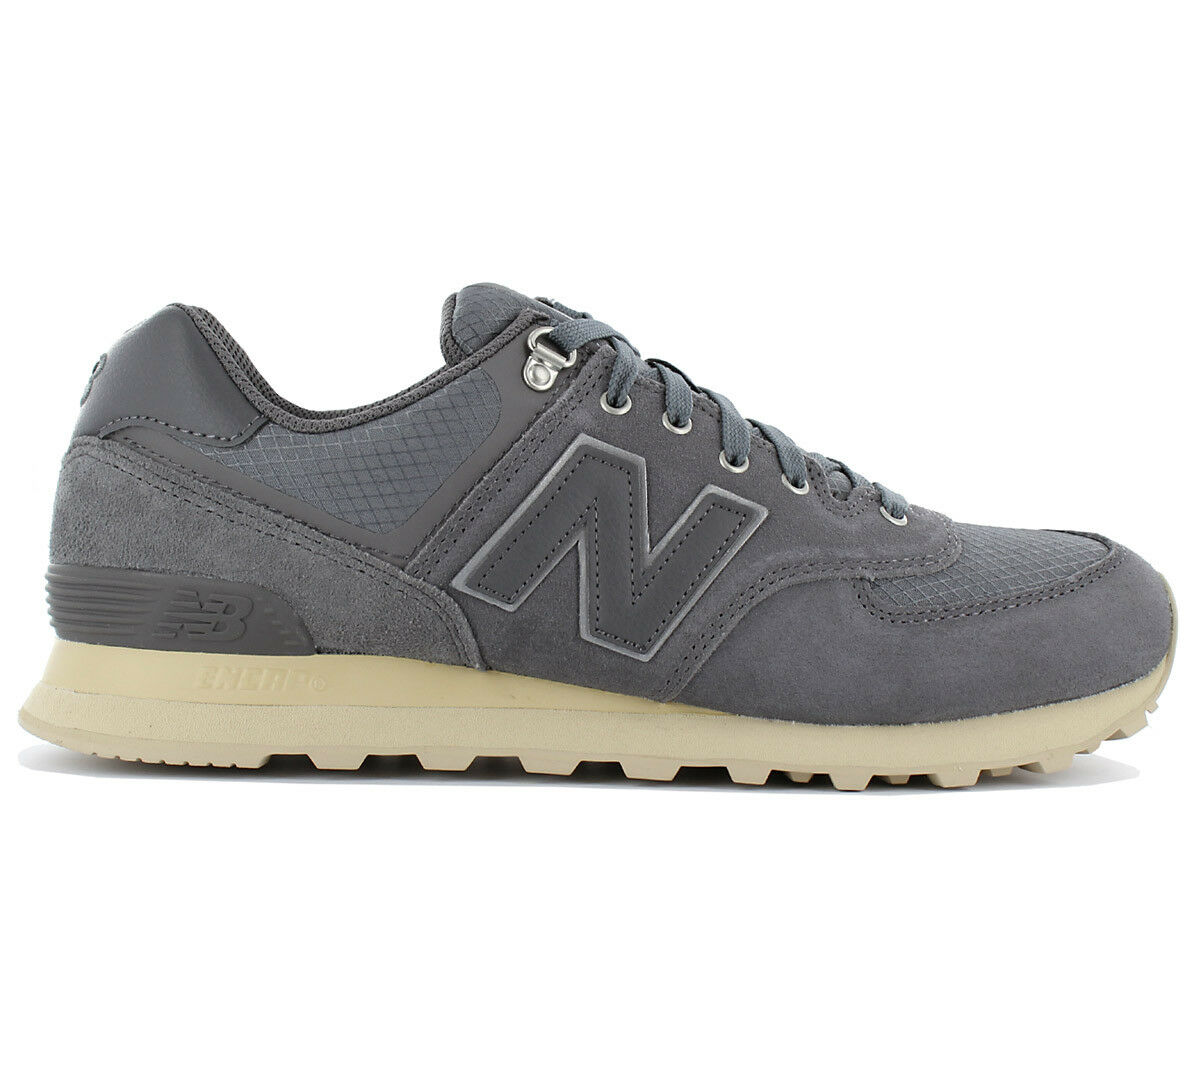 New balance 574 sneaker - klassiker ml574pkq männer schuhe, graue trainer ml574pkq klassiker ml574 e86def